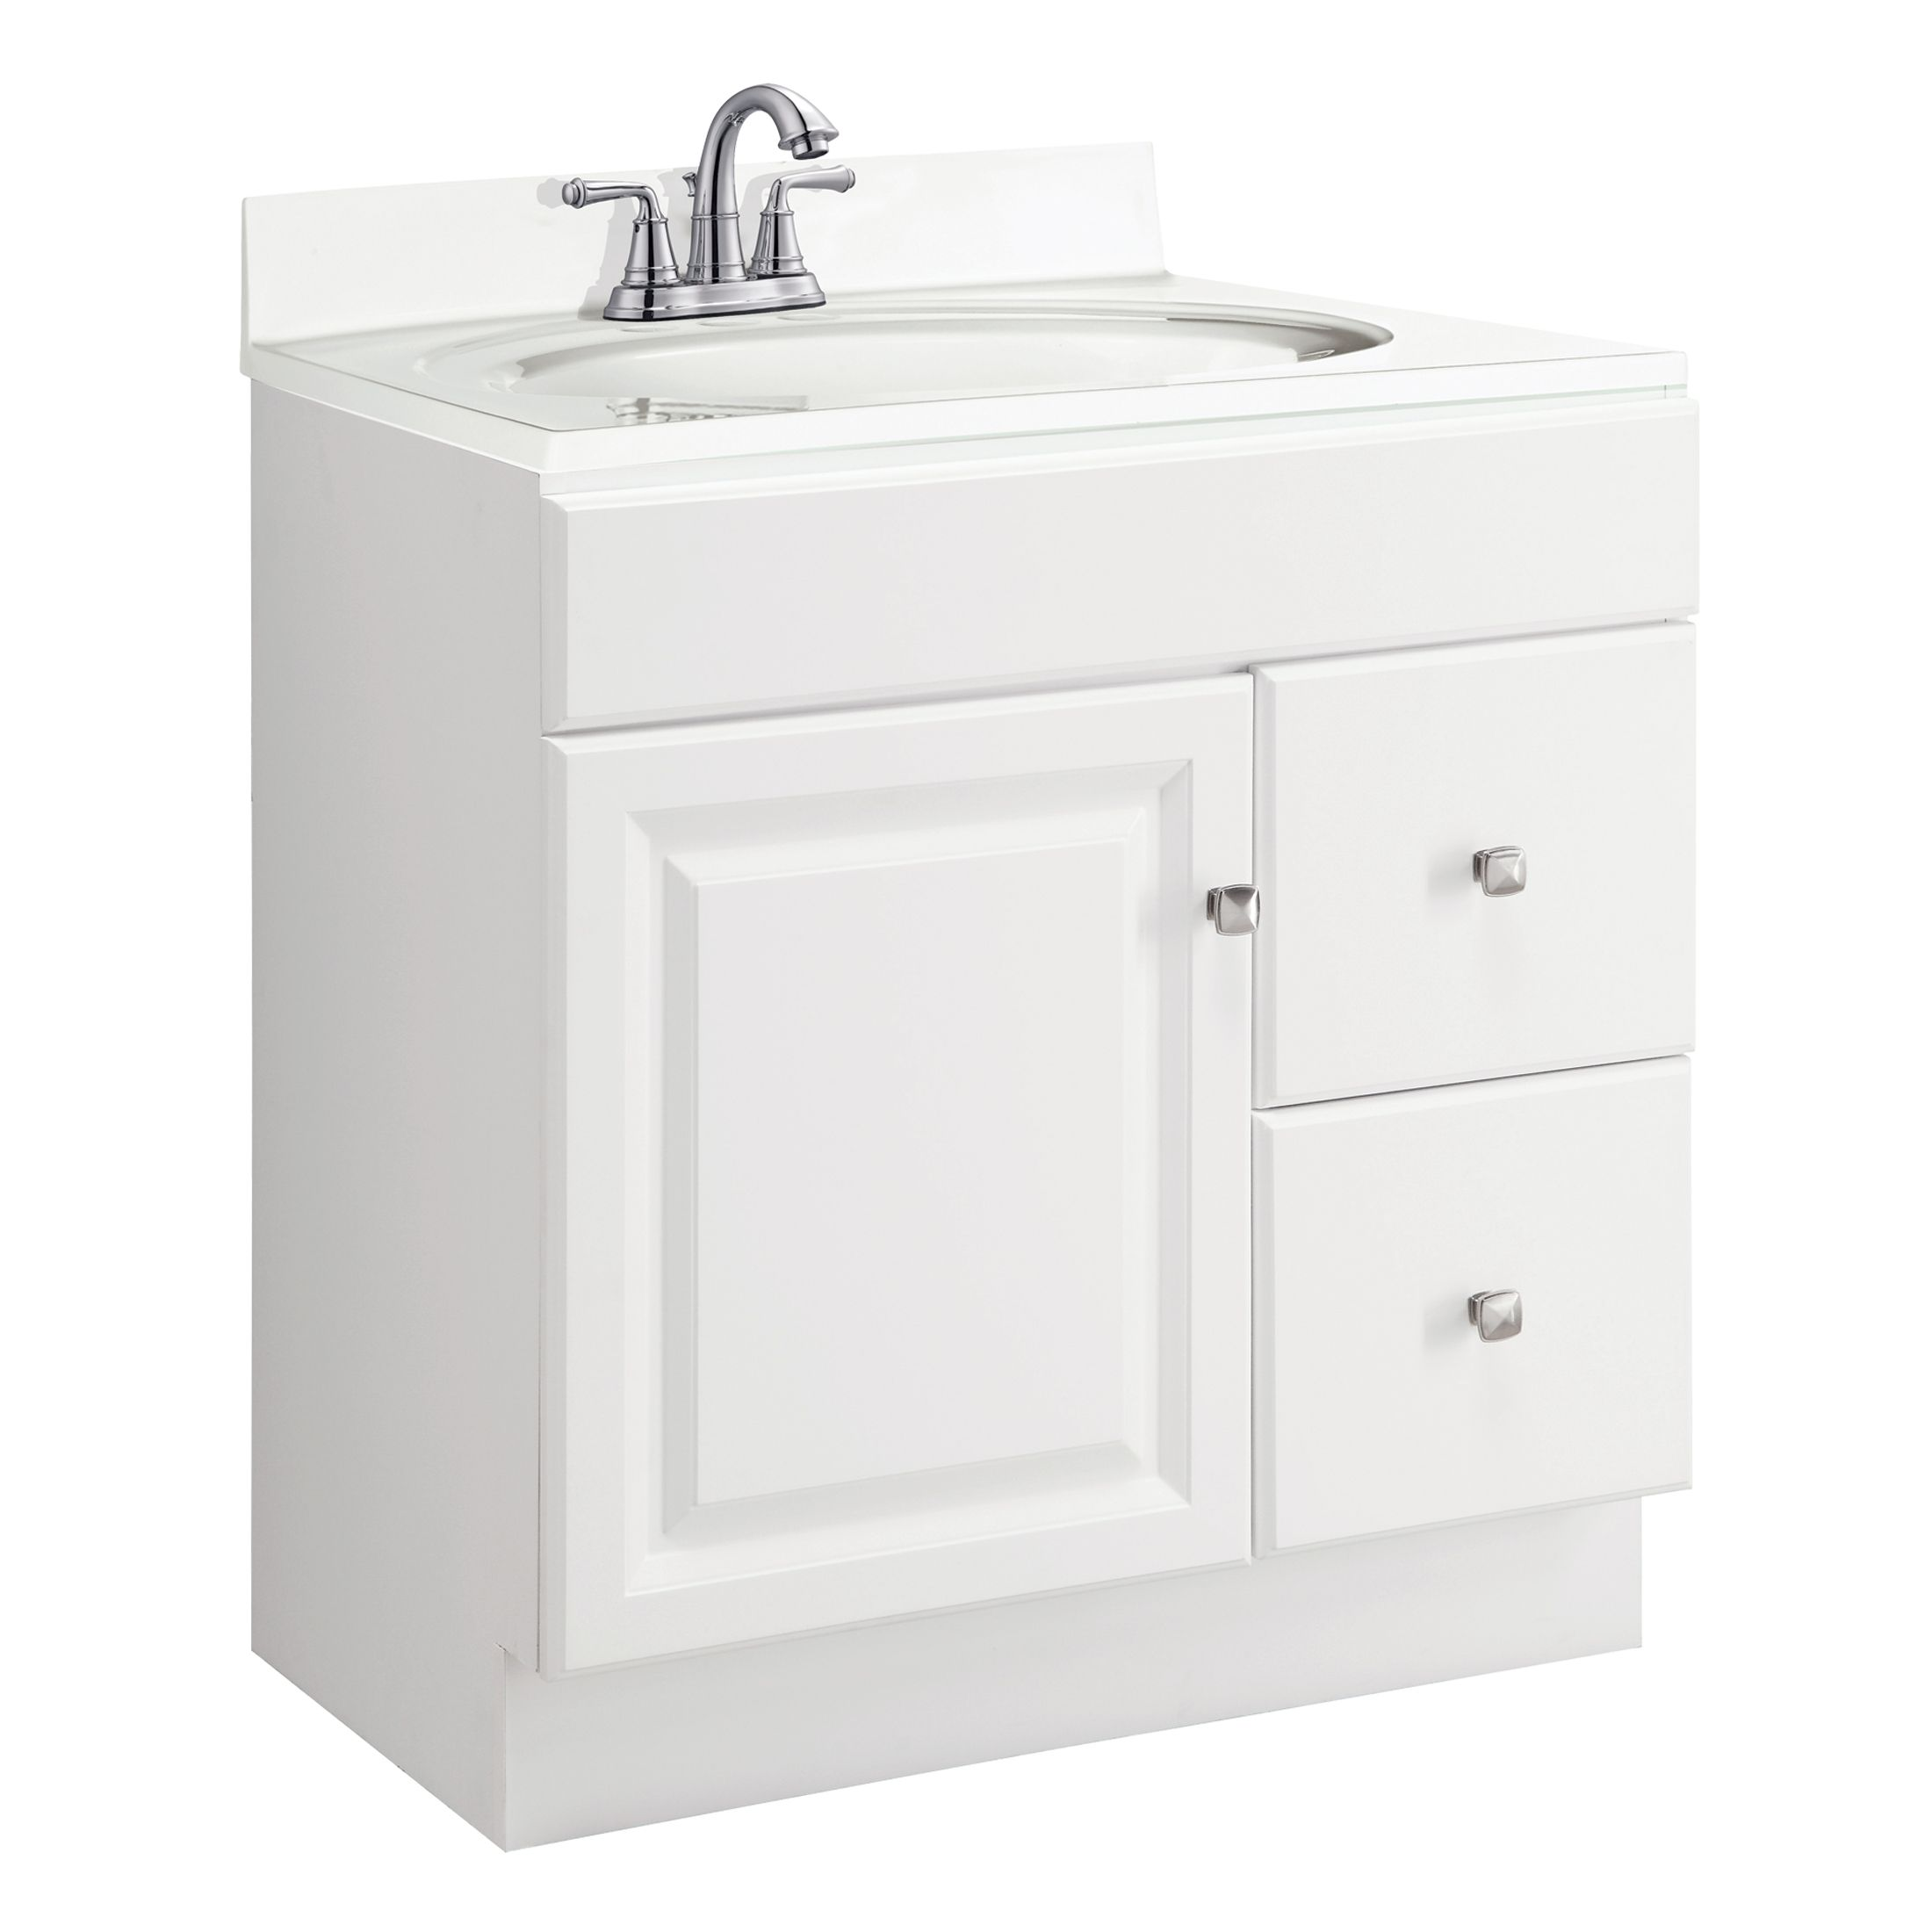 "Wyndham 1-Door 2-Drawer Vanity 30"", White #545079"